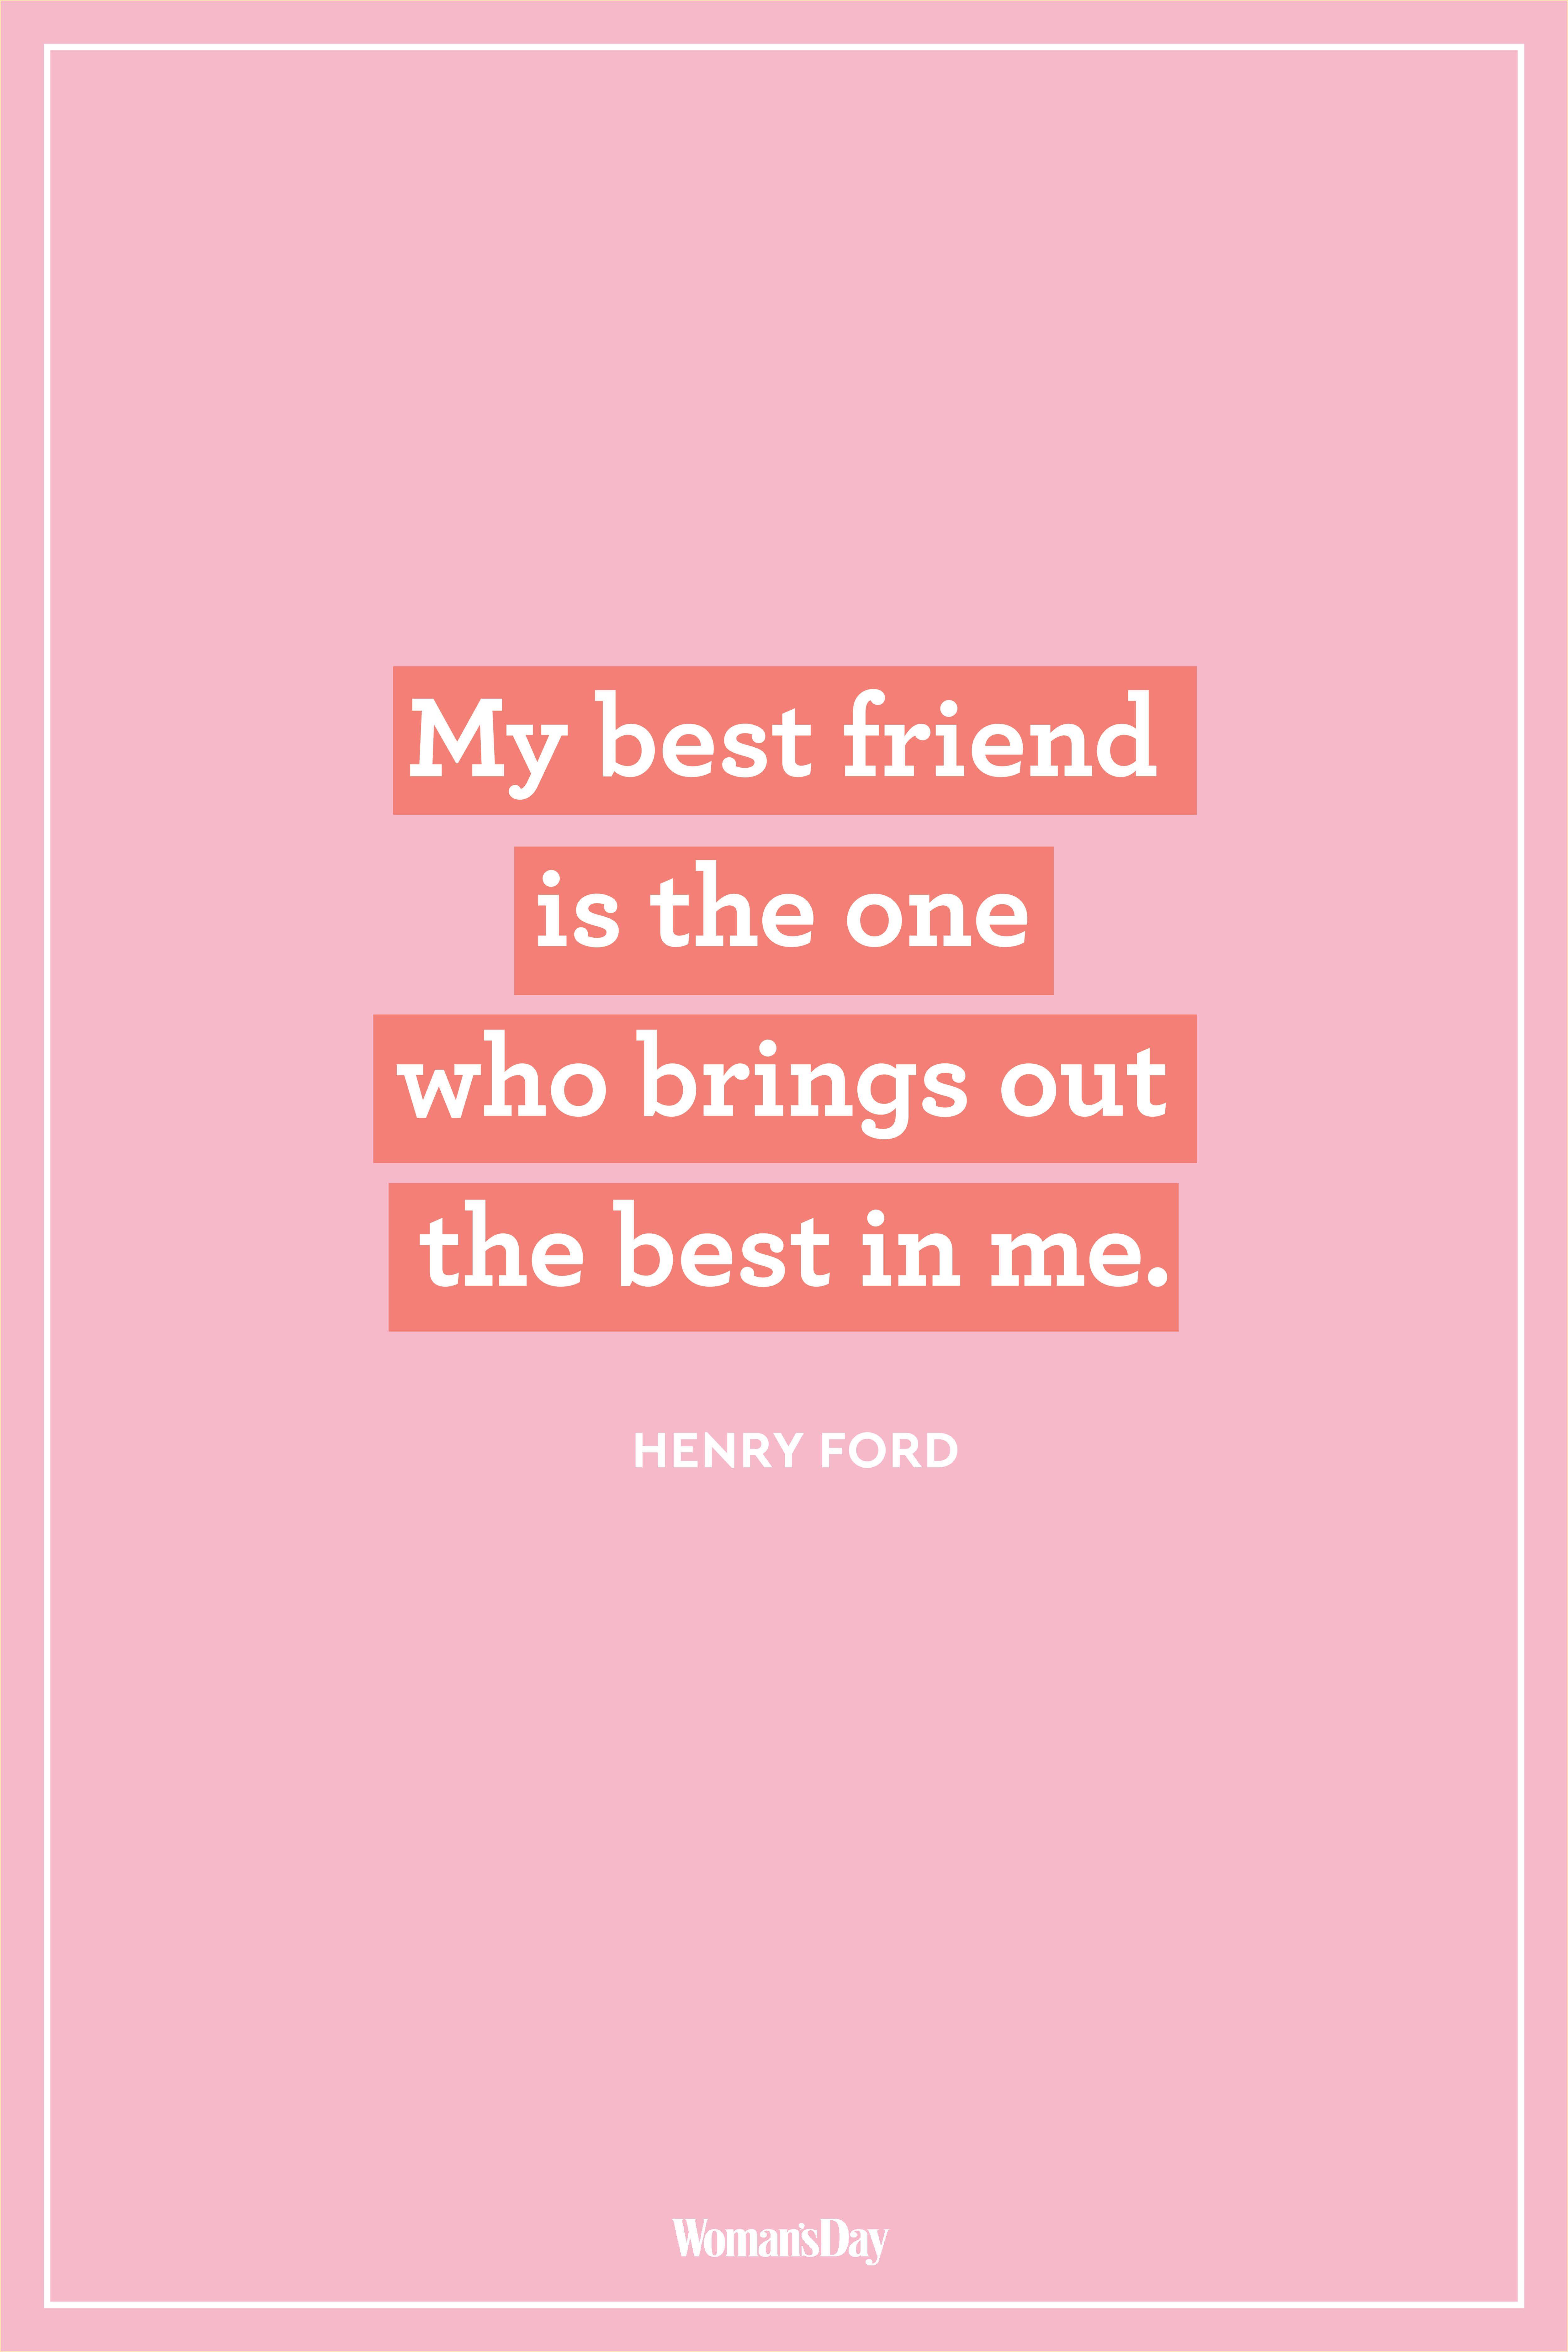 15 Best Friend Quotes Quotes About Best Friends